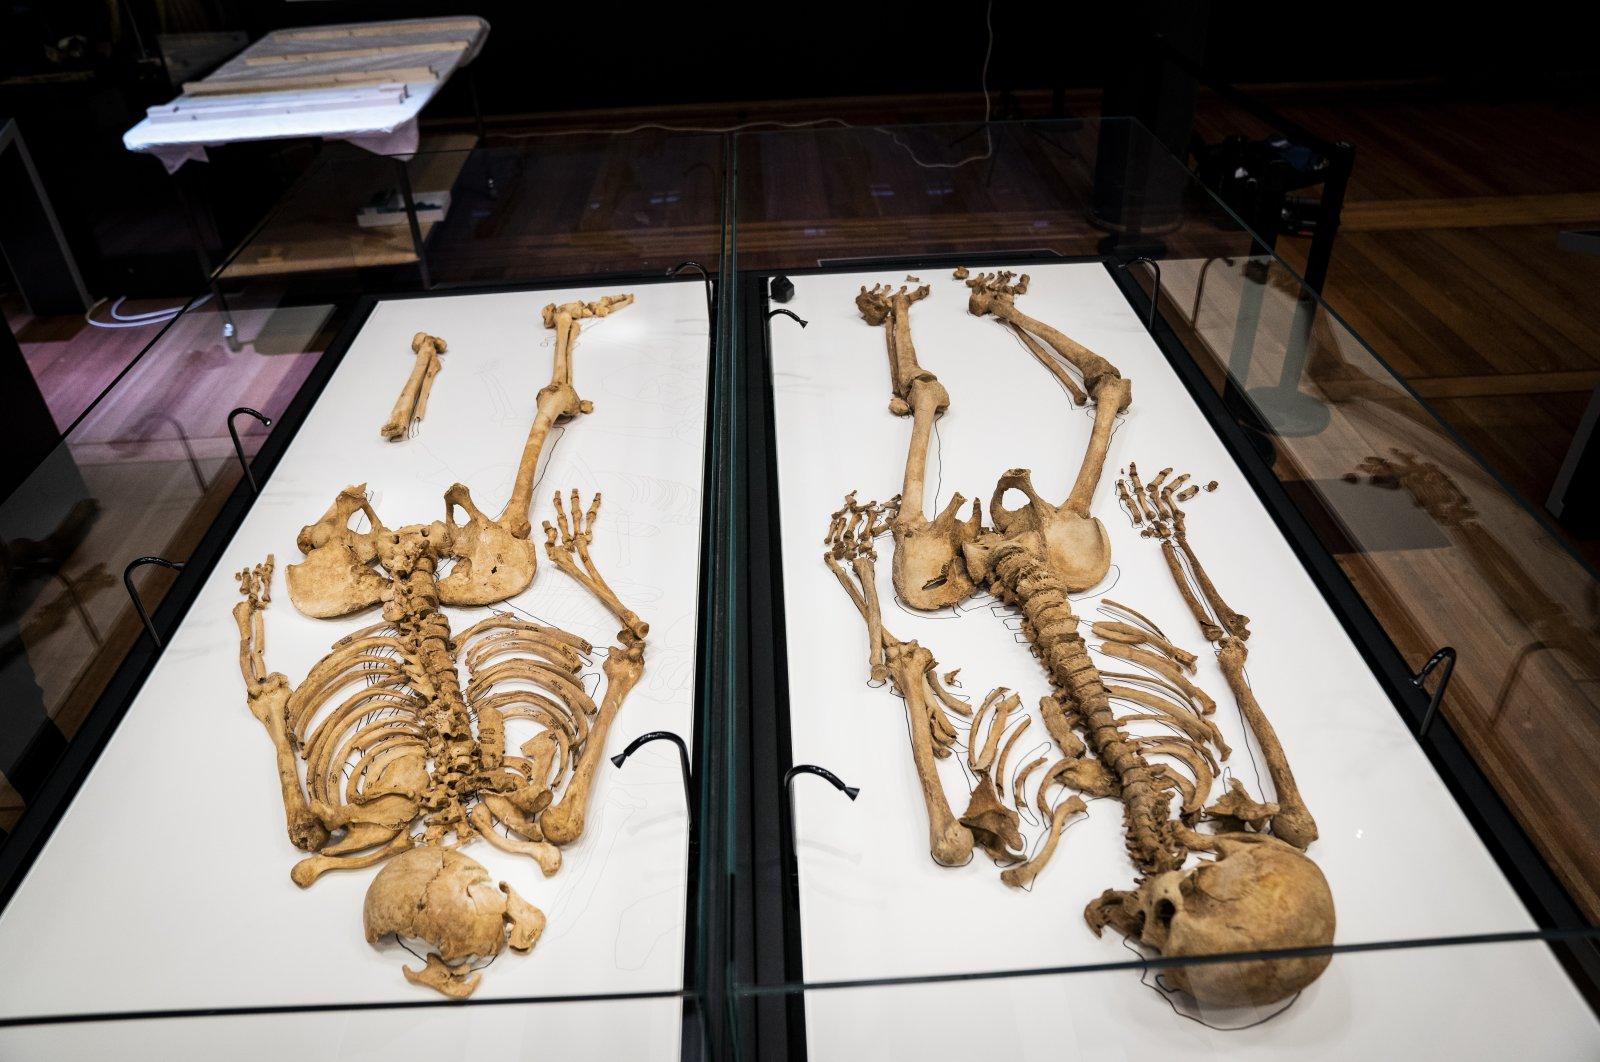 Two skeletons lie in a showcase at the National Museum of Denmark in Copenhagen, June 9, 2021.  (Ida Marie Odgaard/Ritzau Scanpix via AP)